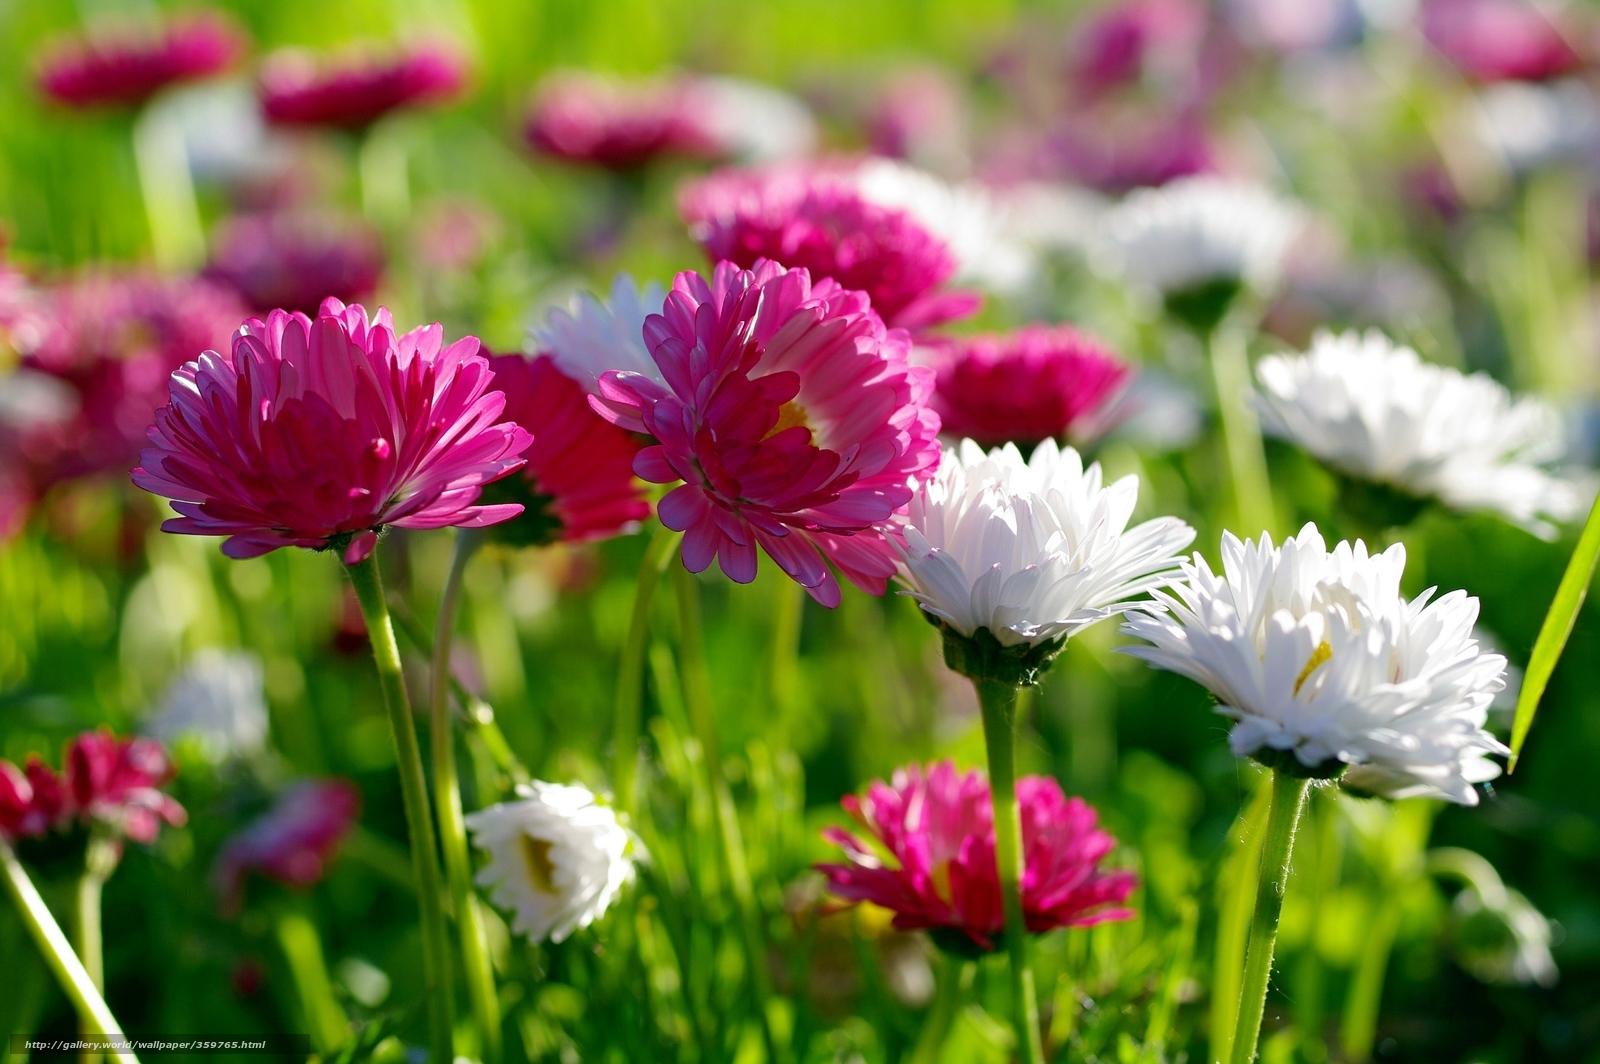 Tlcharger fond d 39 ecran fleurs printemps nature beaut for Sfondi desktop gratis primavera